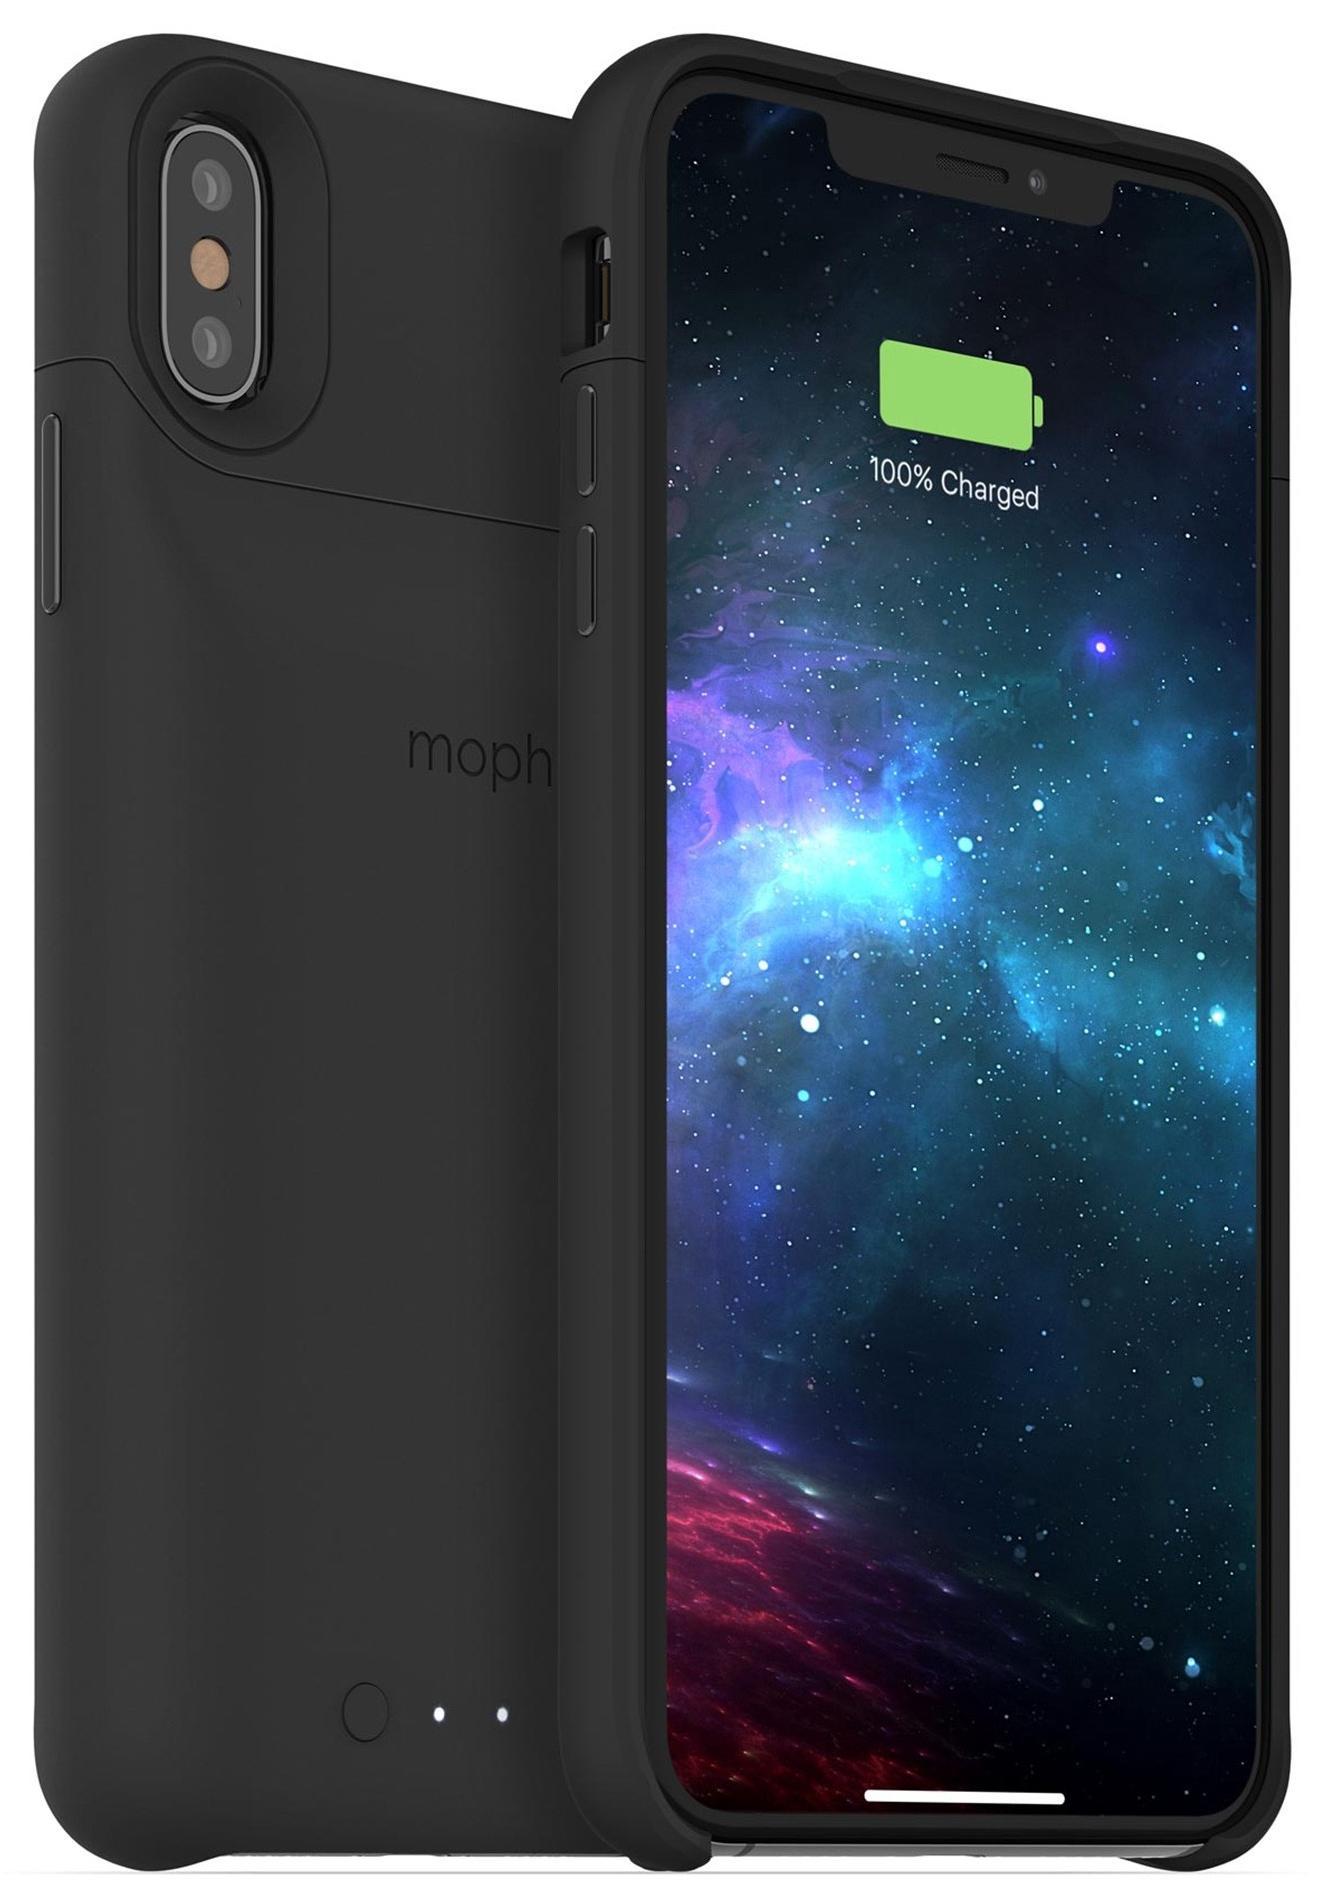 Чехол-аккумулятор Mophie Juice Pack Access для iPhone Xs Max Black